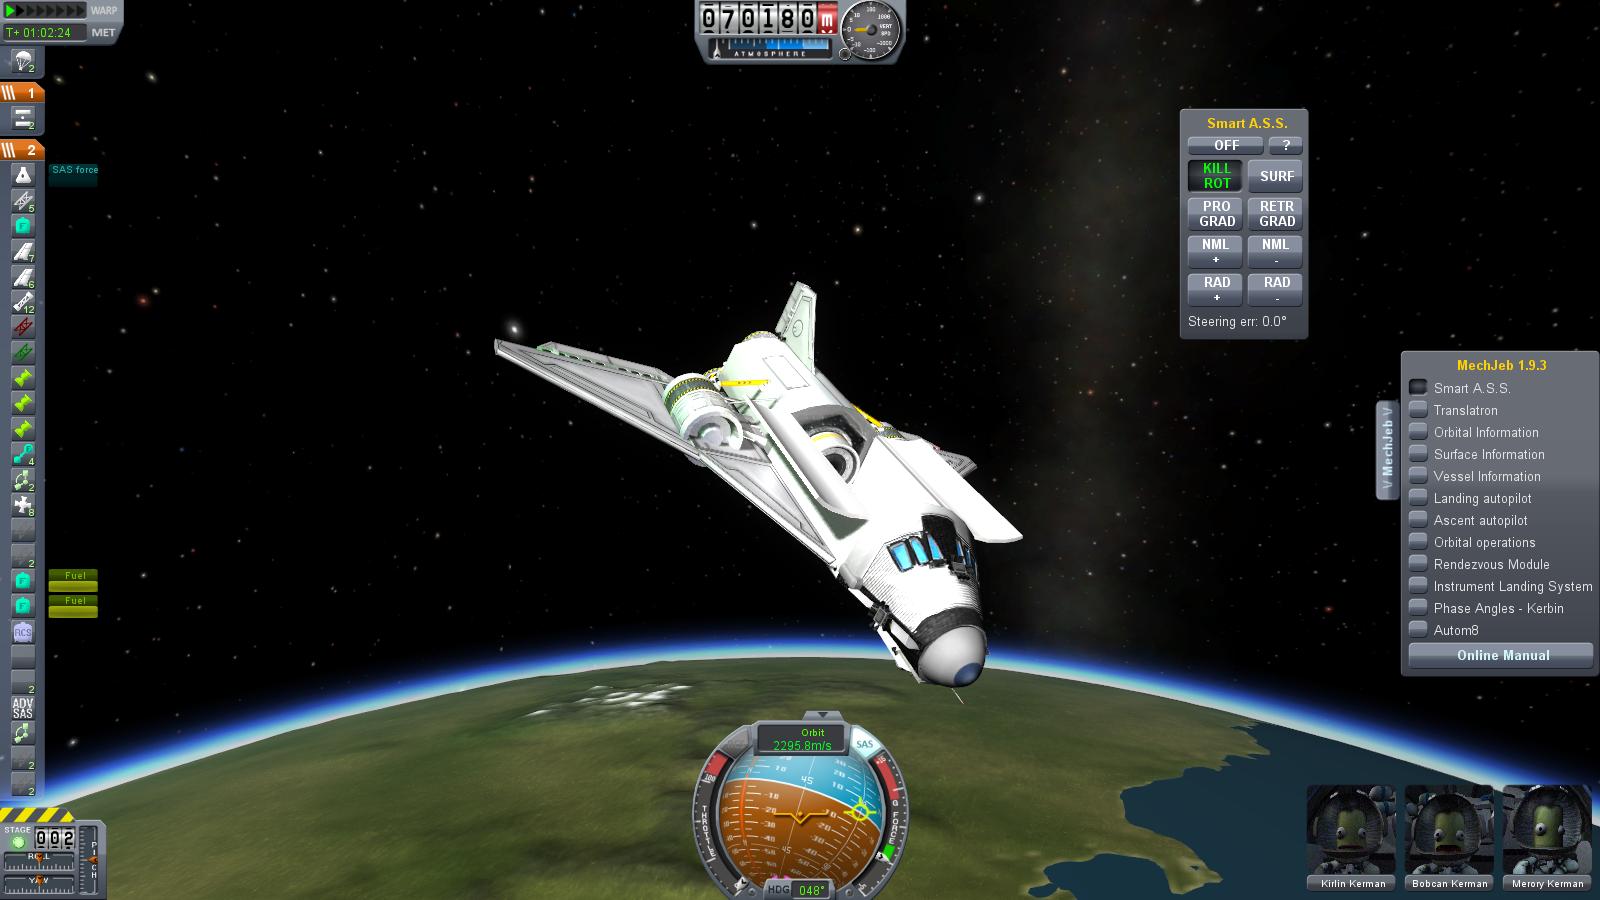 kerbal space program - photo #2